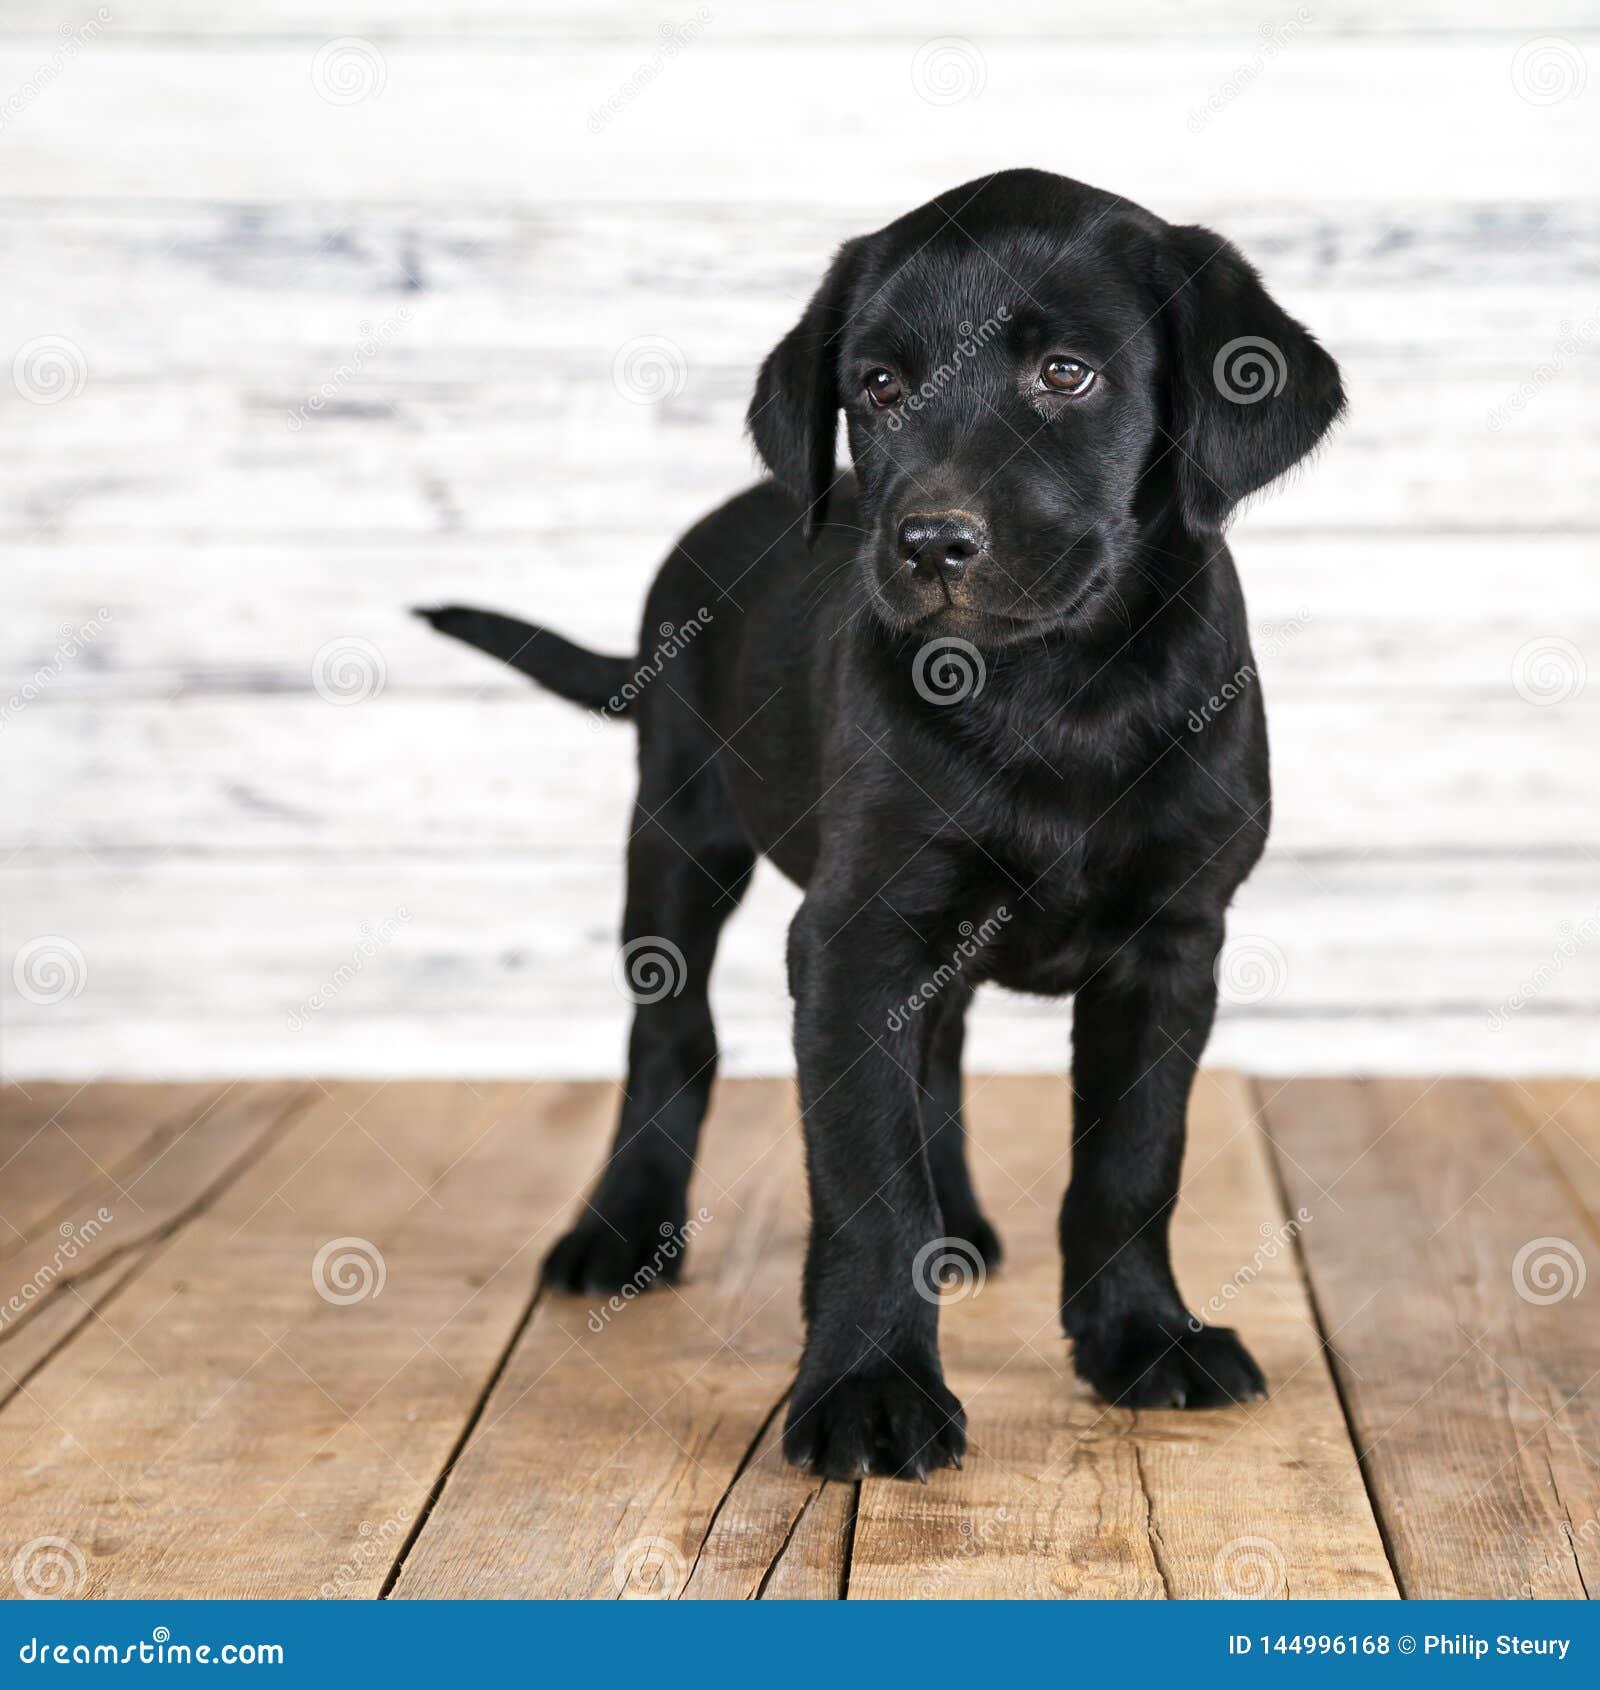 Cute Black Labrador Puppy Stock Photo Image Of Cute 144996168